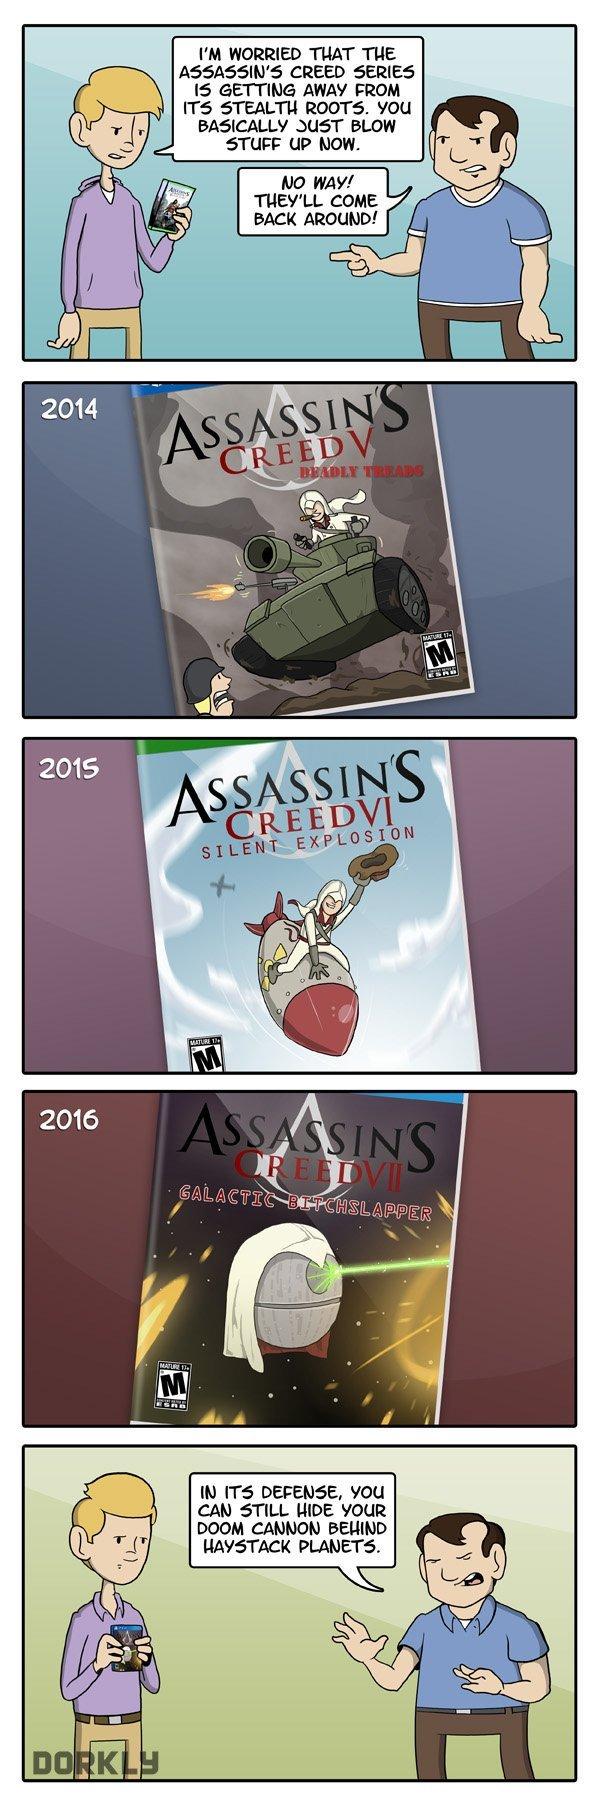 "The Future of Assassin's Creed. . PM THAT TUE ASSASIN' {REED teii t! arrt"" raa AWAY FRAM querr BLUFF STU"" LIP HUN. IN rrs , 'FEM CAN STILL HIDE VGUI DOOM IMBHDH funny comic Dorkly new Cars Crash games Money Guns fire Pokemon doge meme black k lol"